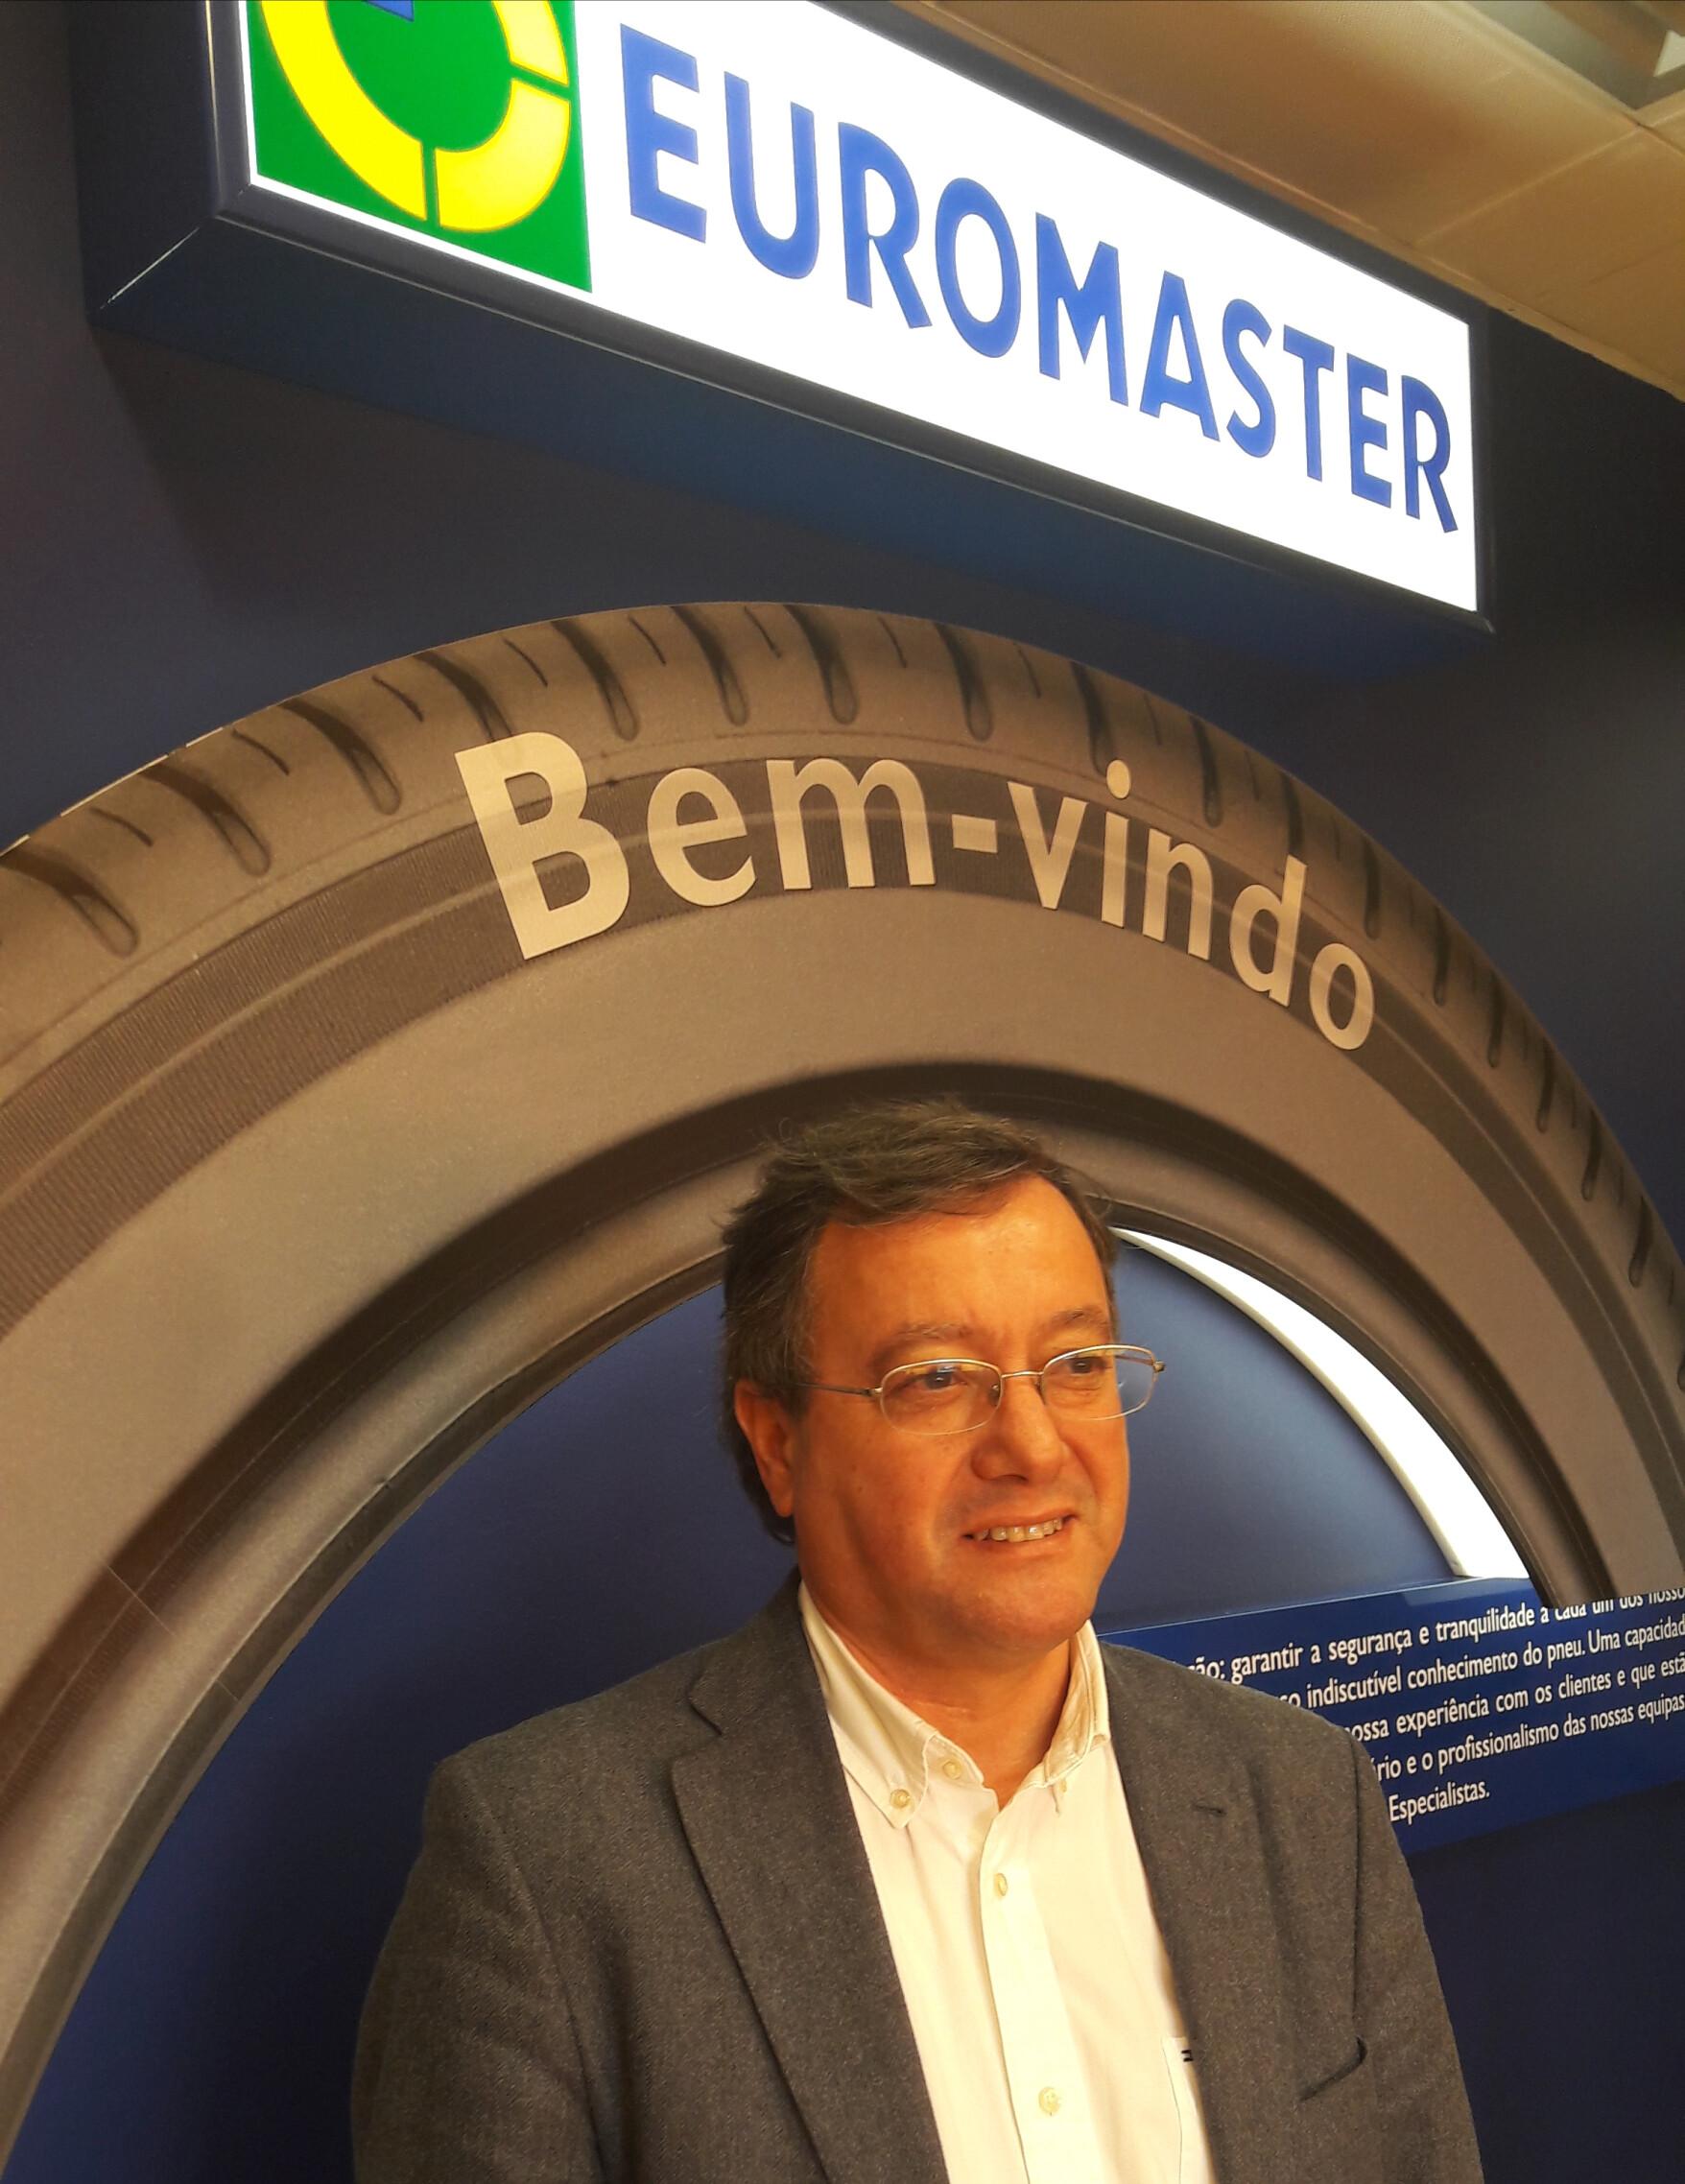 Vítor Soares - Euromaster